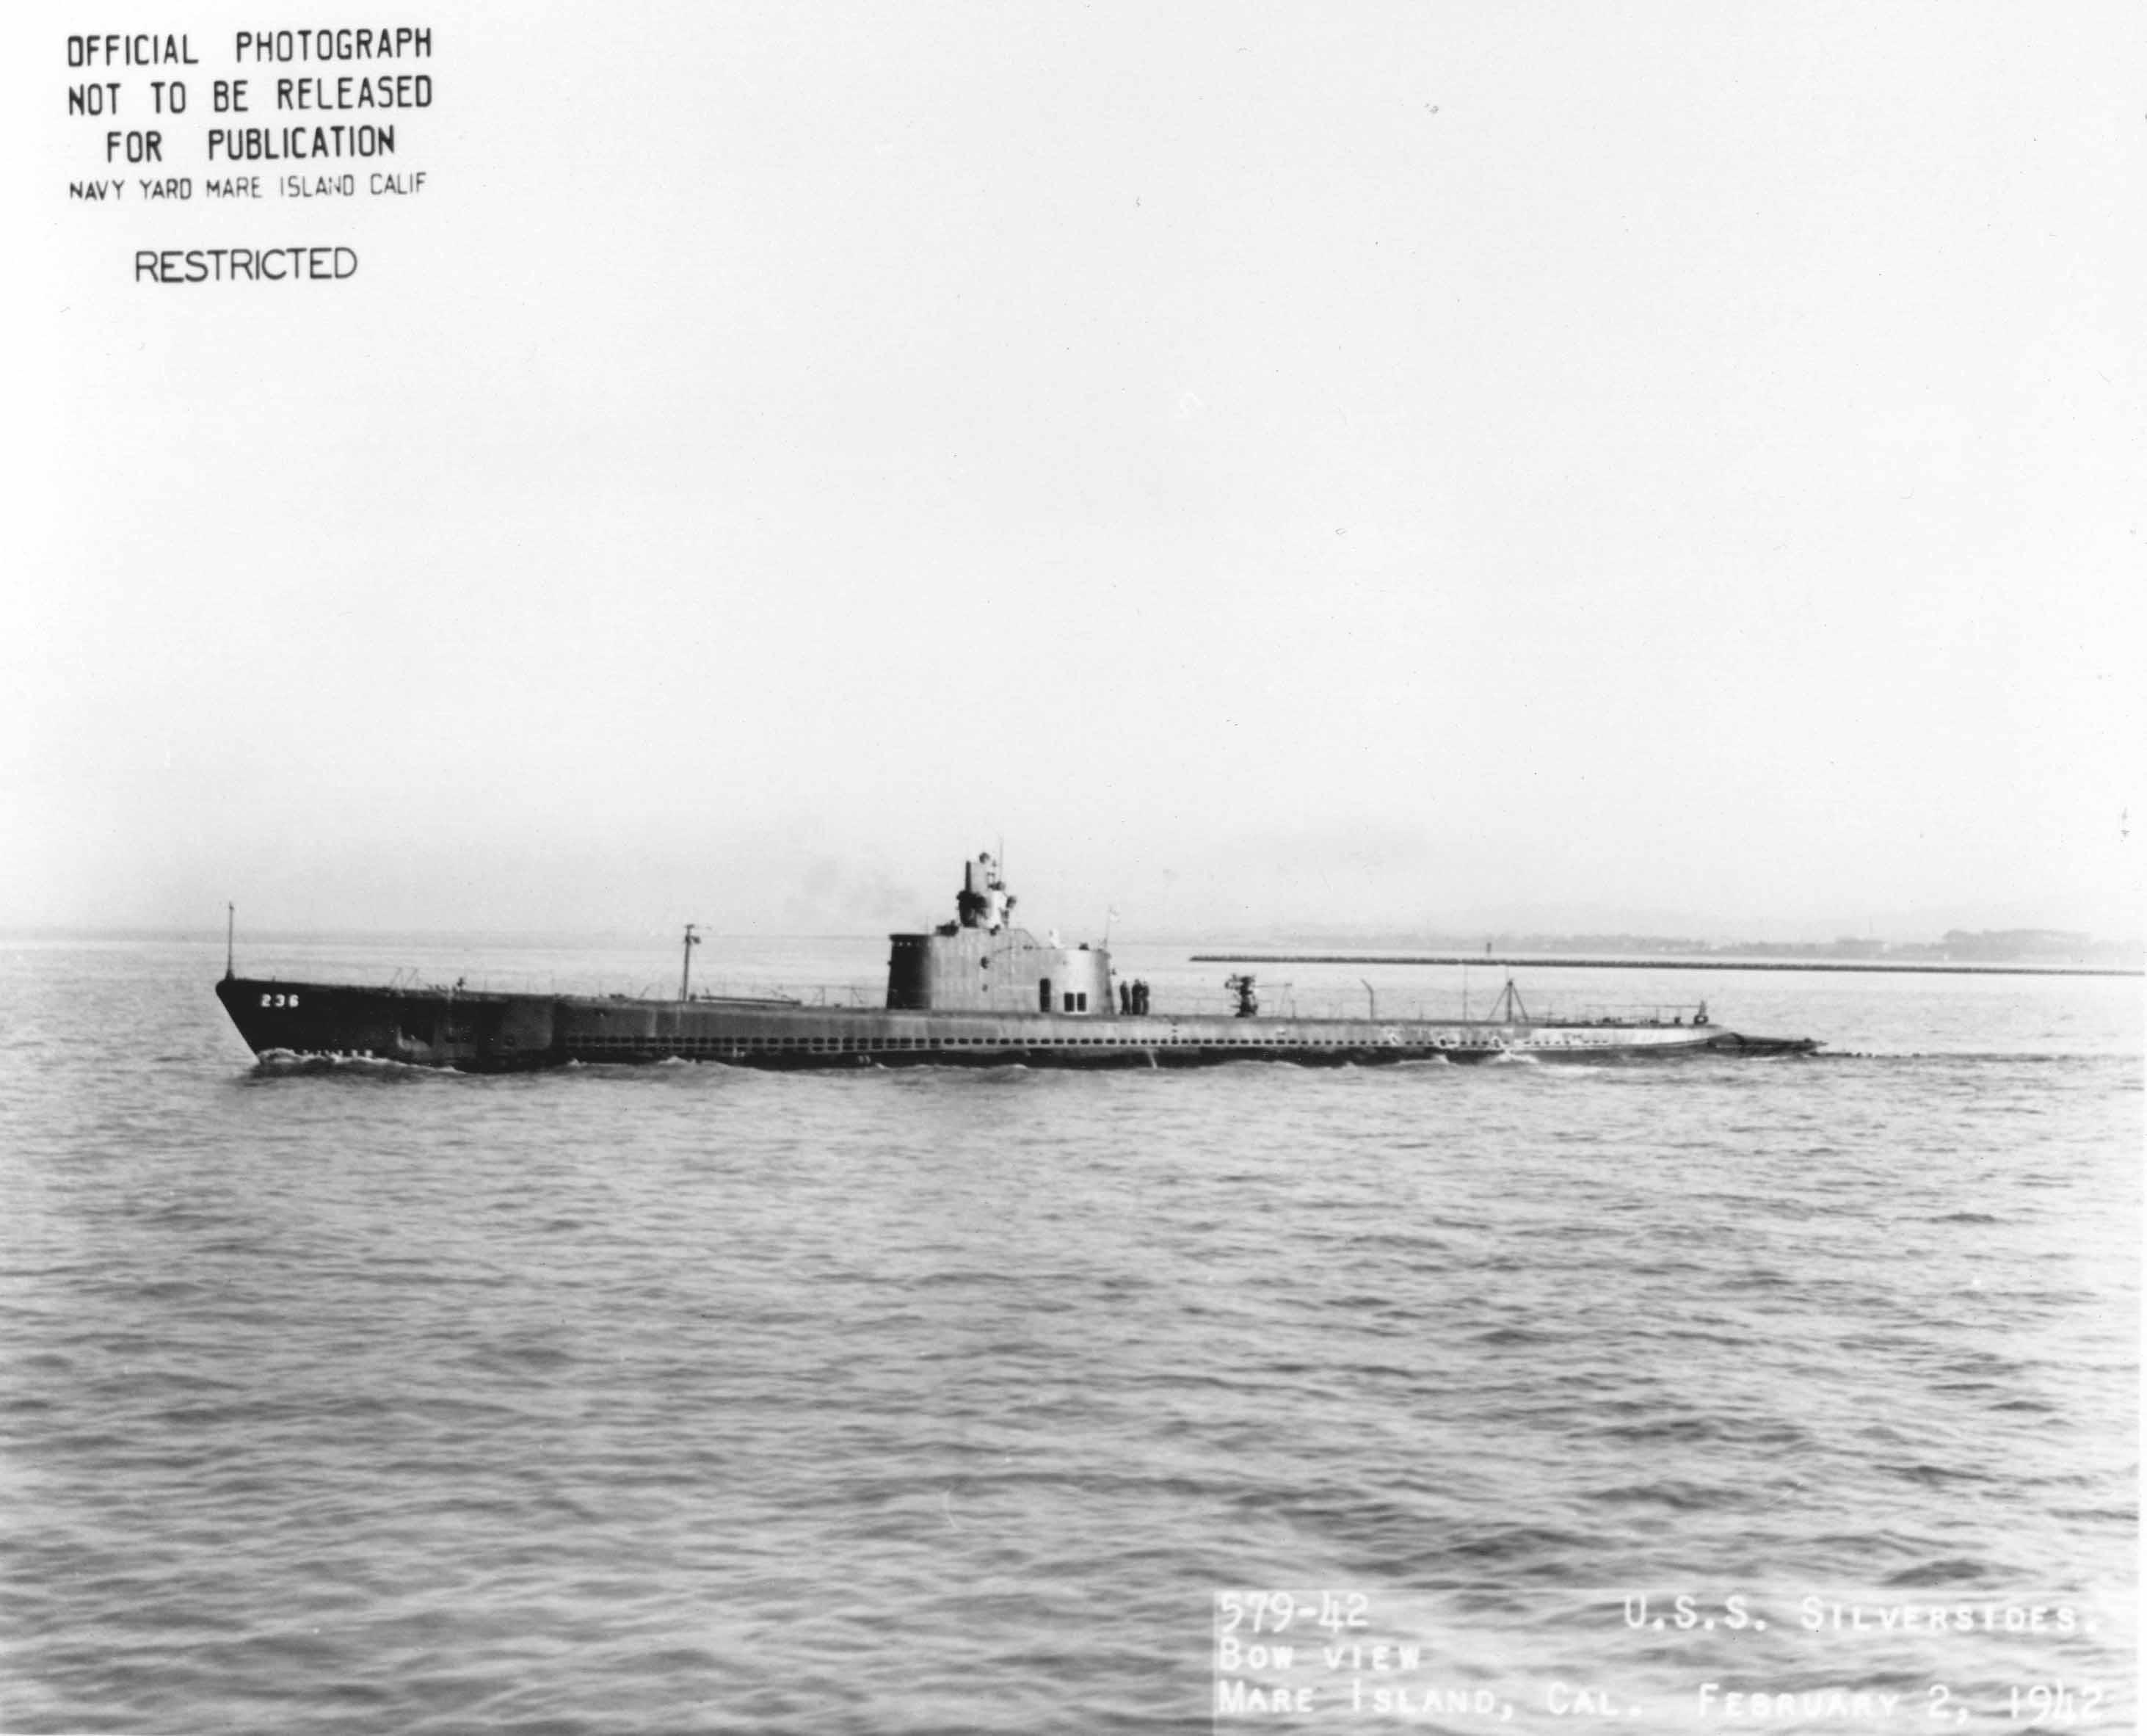 USS Silversides near her port of origin, the Mare Island Navy Yard in Vallejo, California, during World War II.